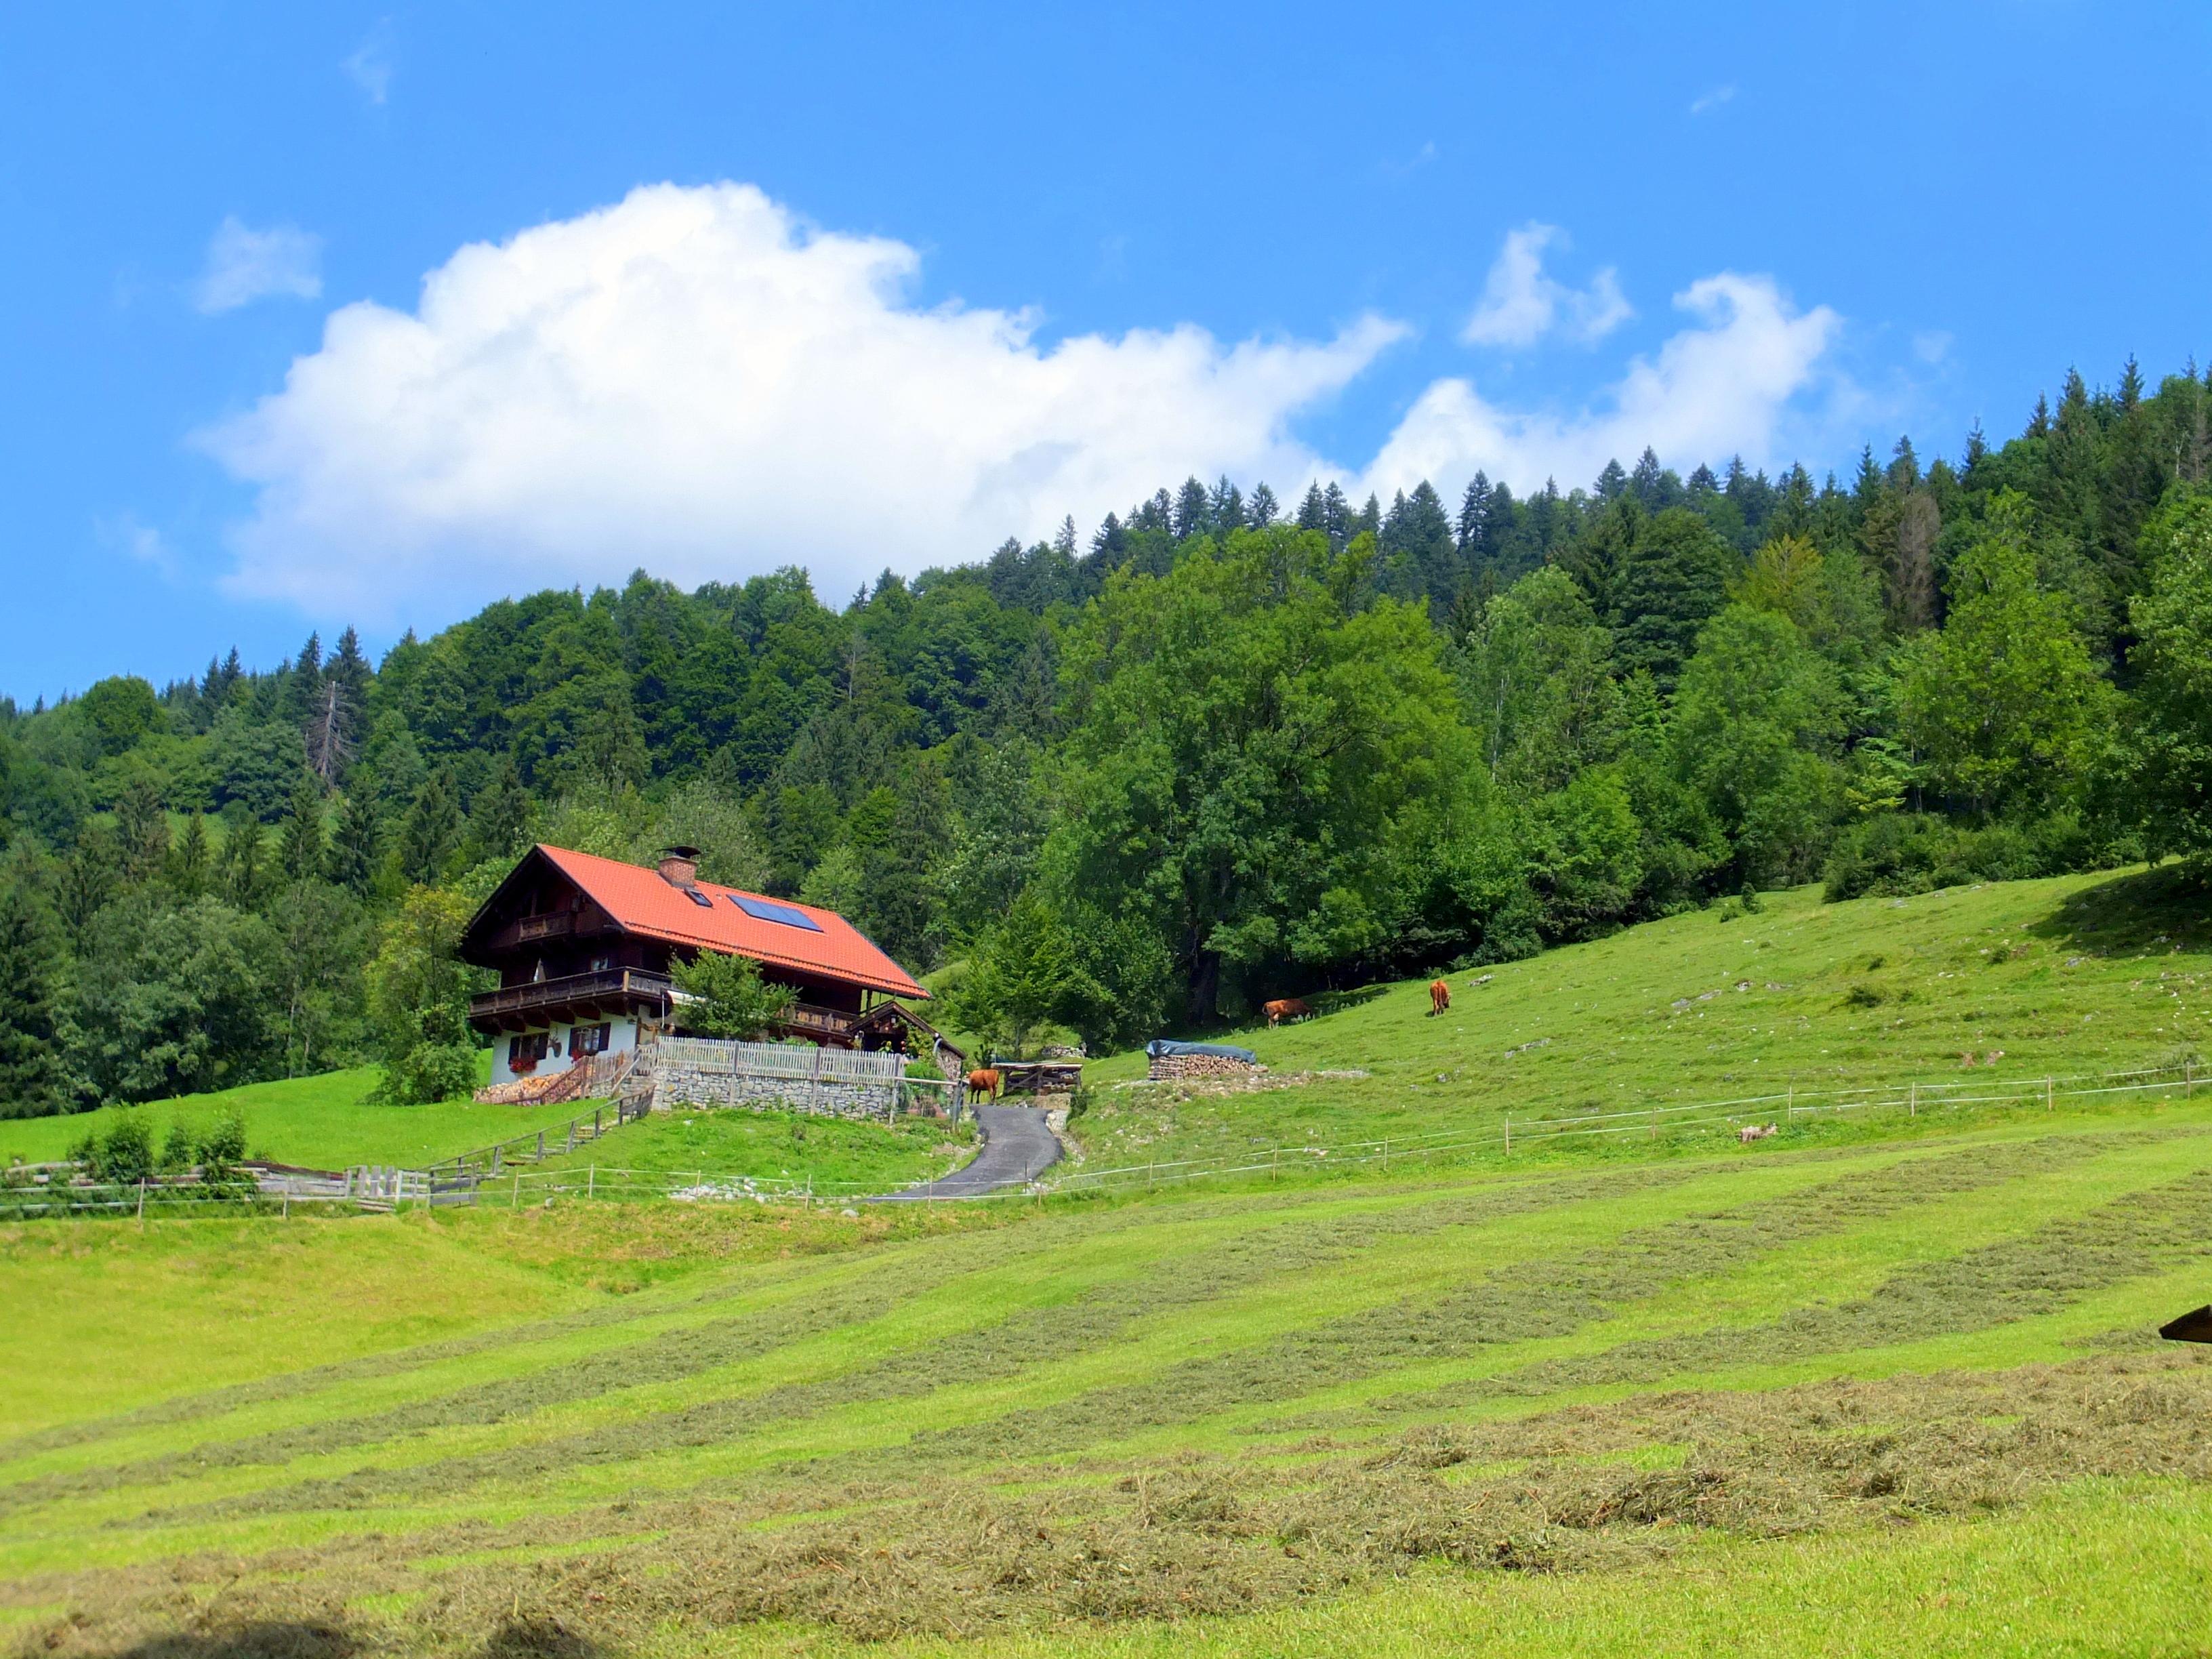 German countryside. Photo credit: James Cridland